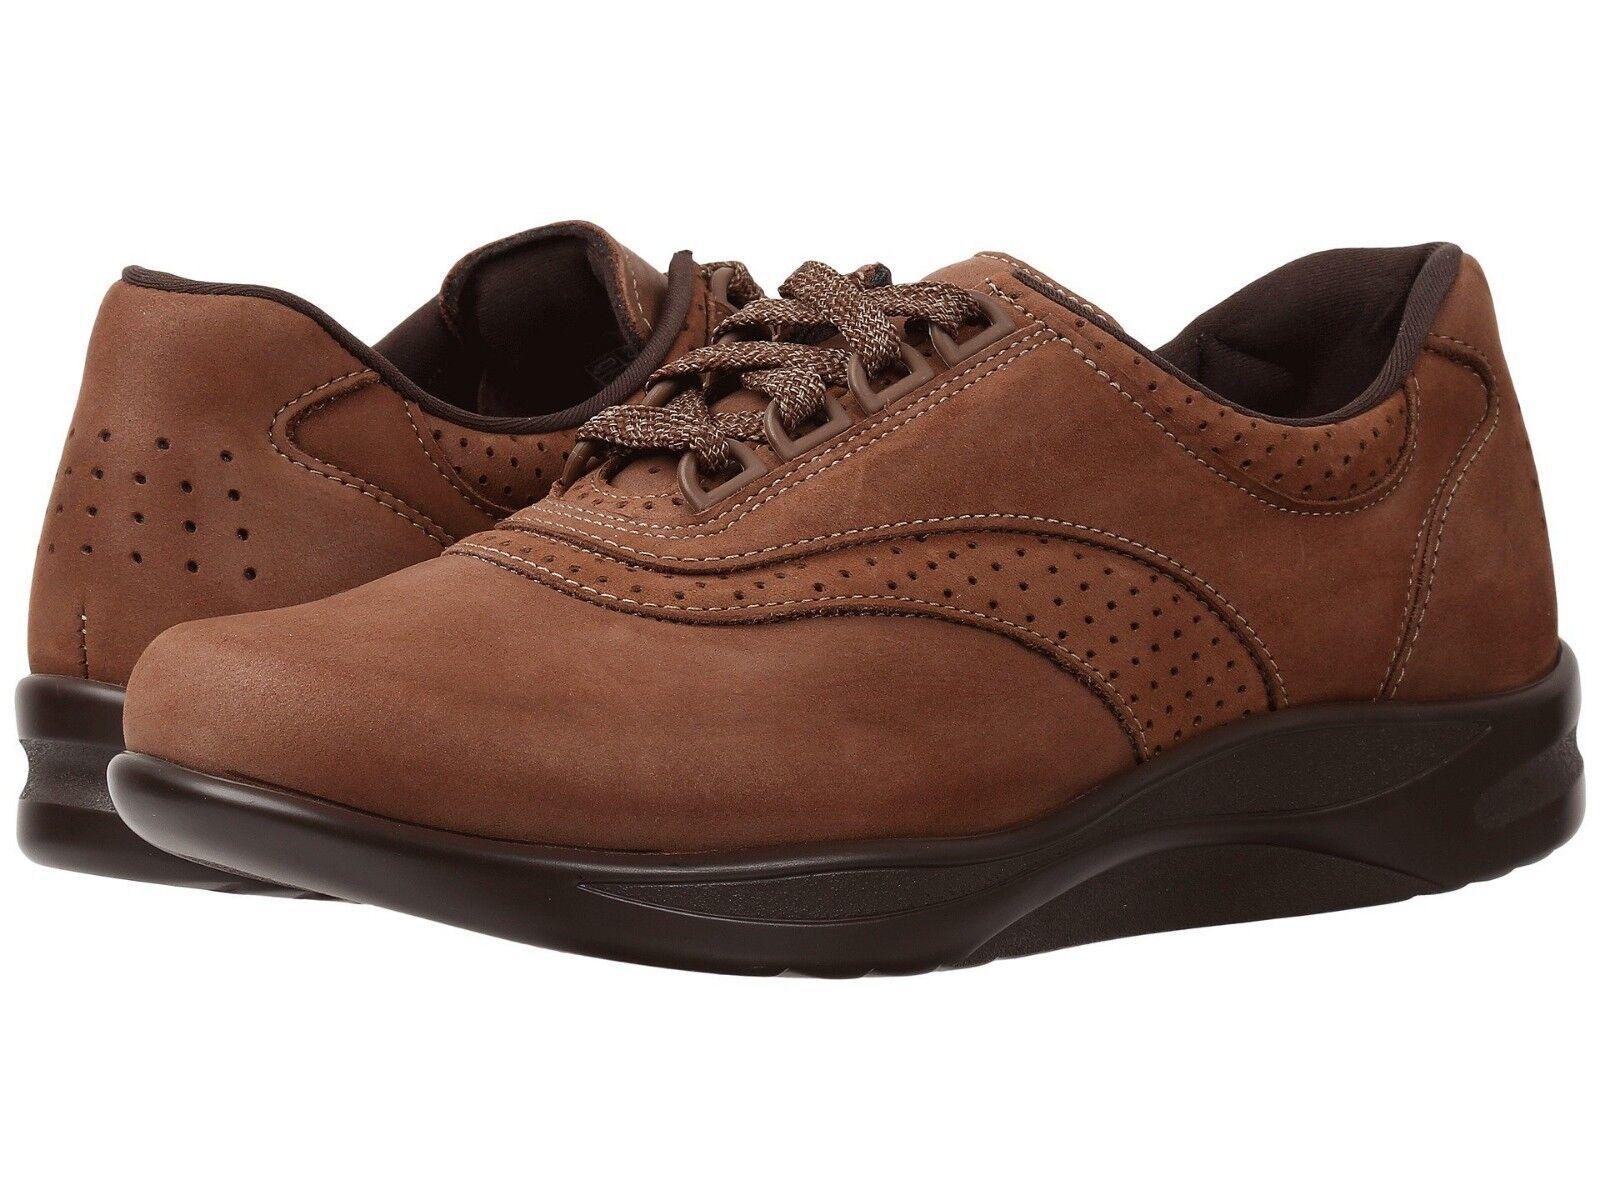 SAS WALK EASY damen Comfort Chocolate 2380 076 Leather Comfort damen Lace Up Turnschuhe schuhe 1d6ce3